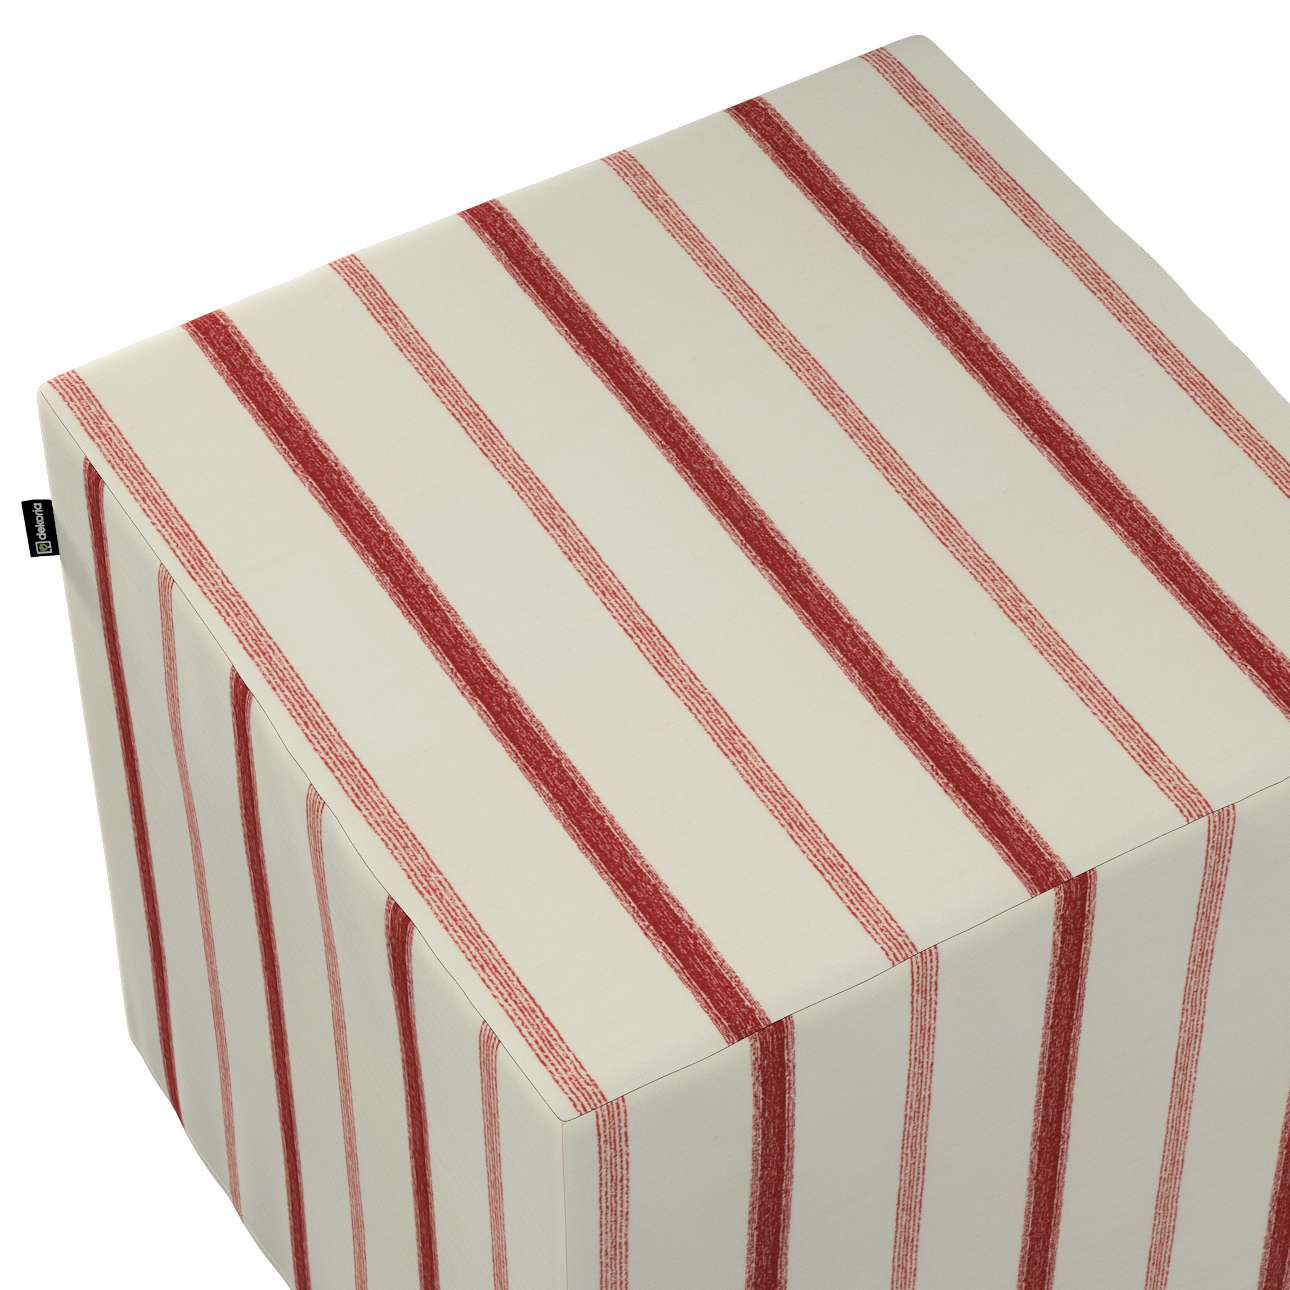 Sedák Cube - kostka pevná 40x40x40 v kolekci Avignon, látka: 129-15